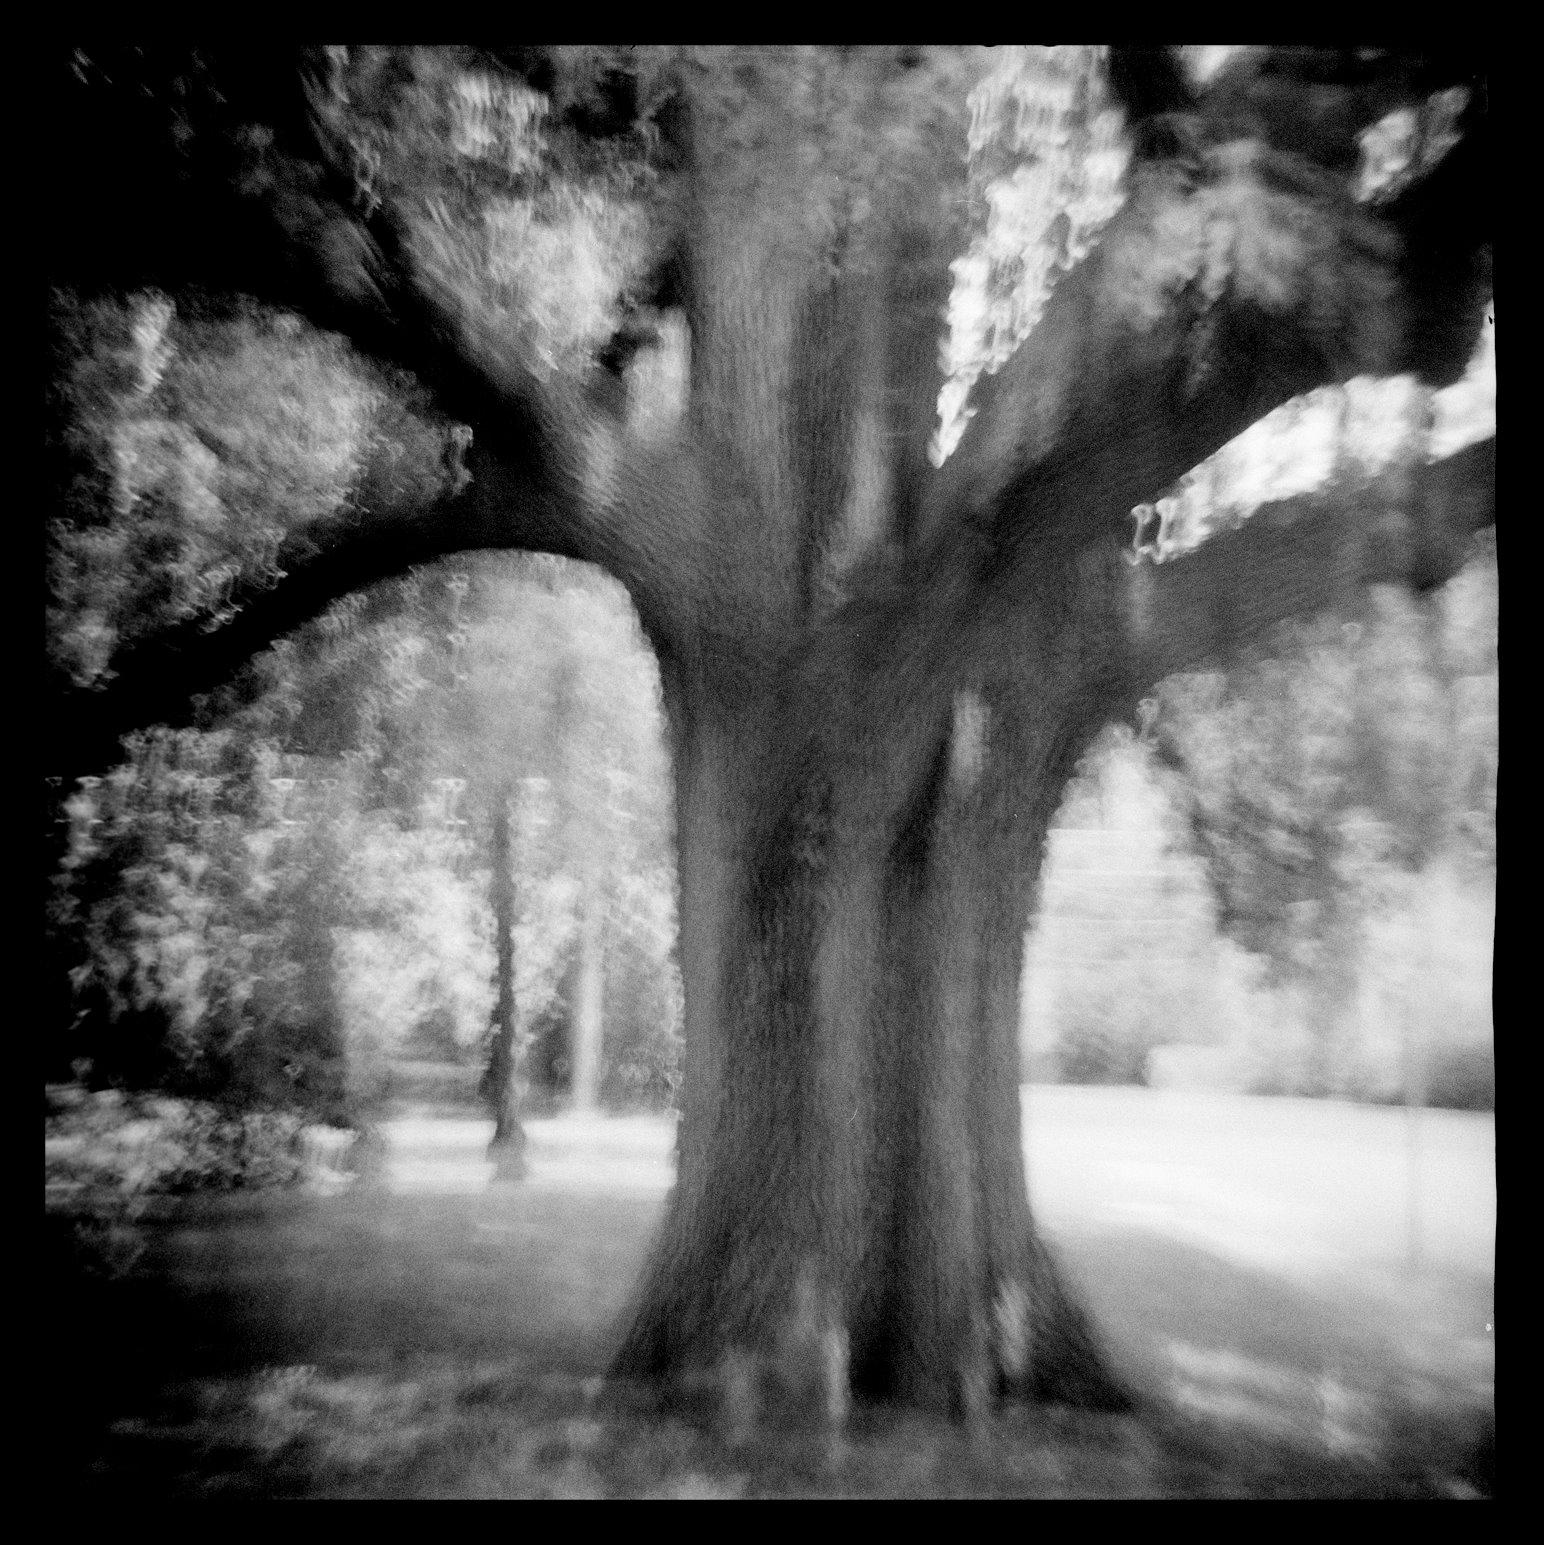 Moving Tree